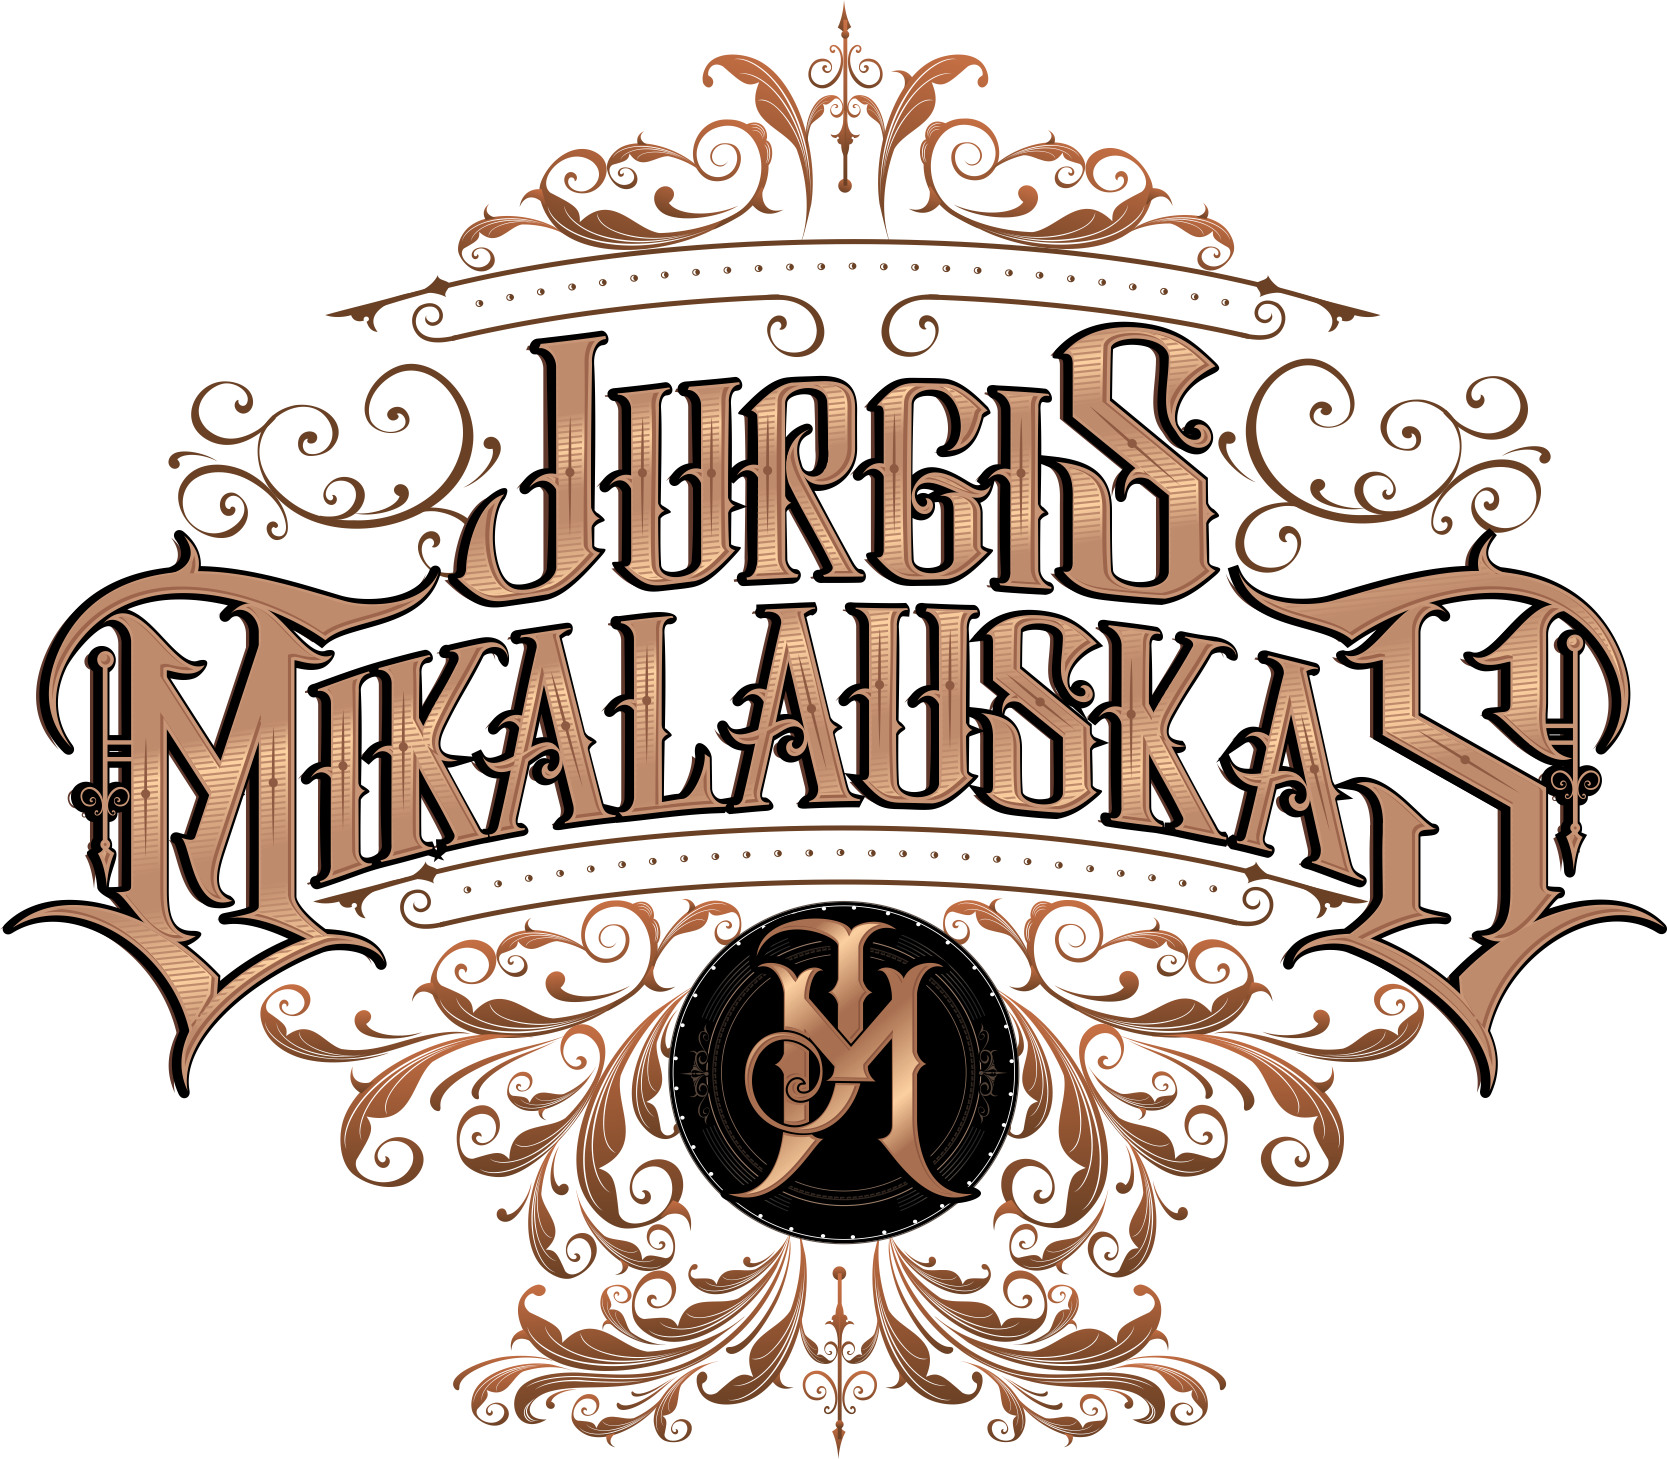 Jurgis Mikalauskas Tattoo